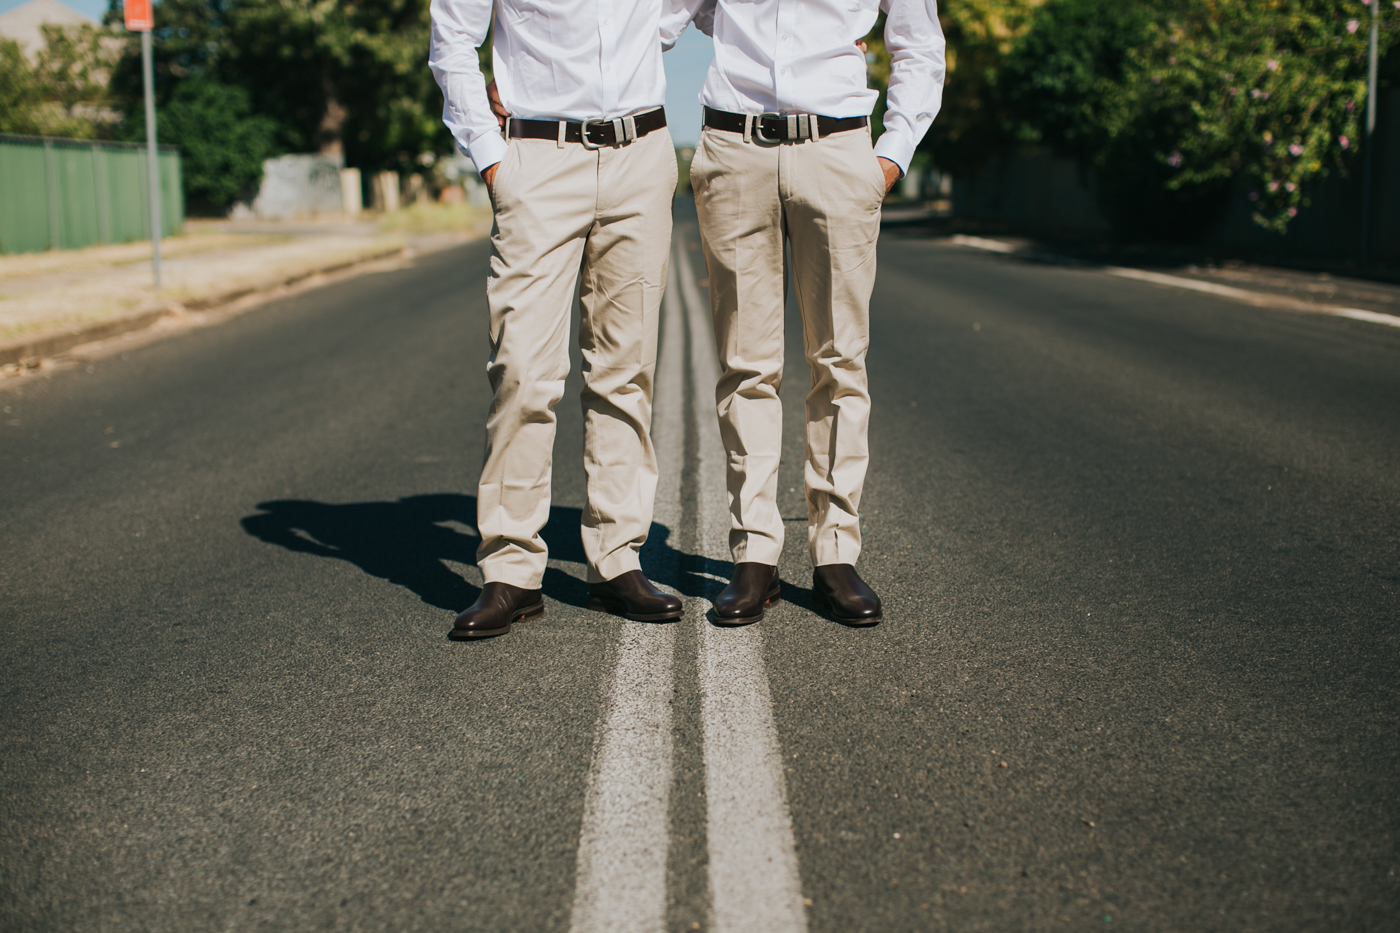 Nicolle & Jacob - Dubbo Wedding - Country Australia - Samantha Heather Photography-31.jpg